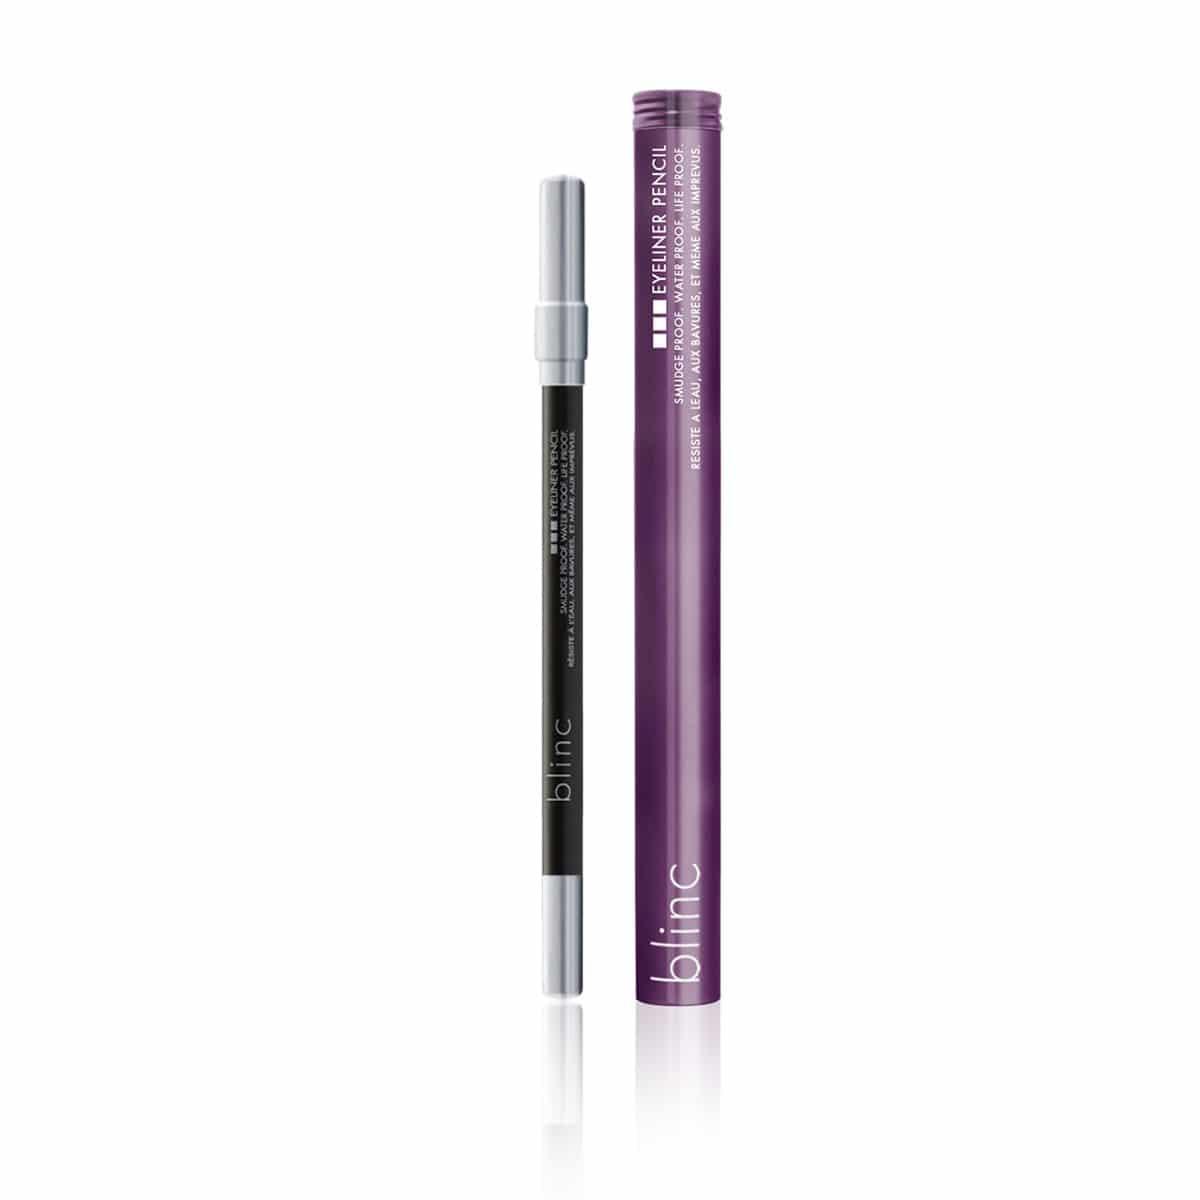 Blinc Eyeliner Pencil - Blue